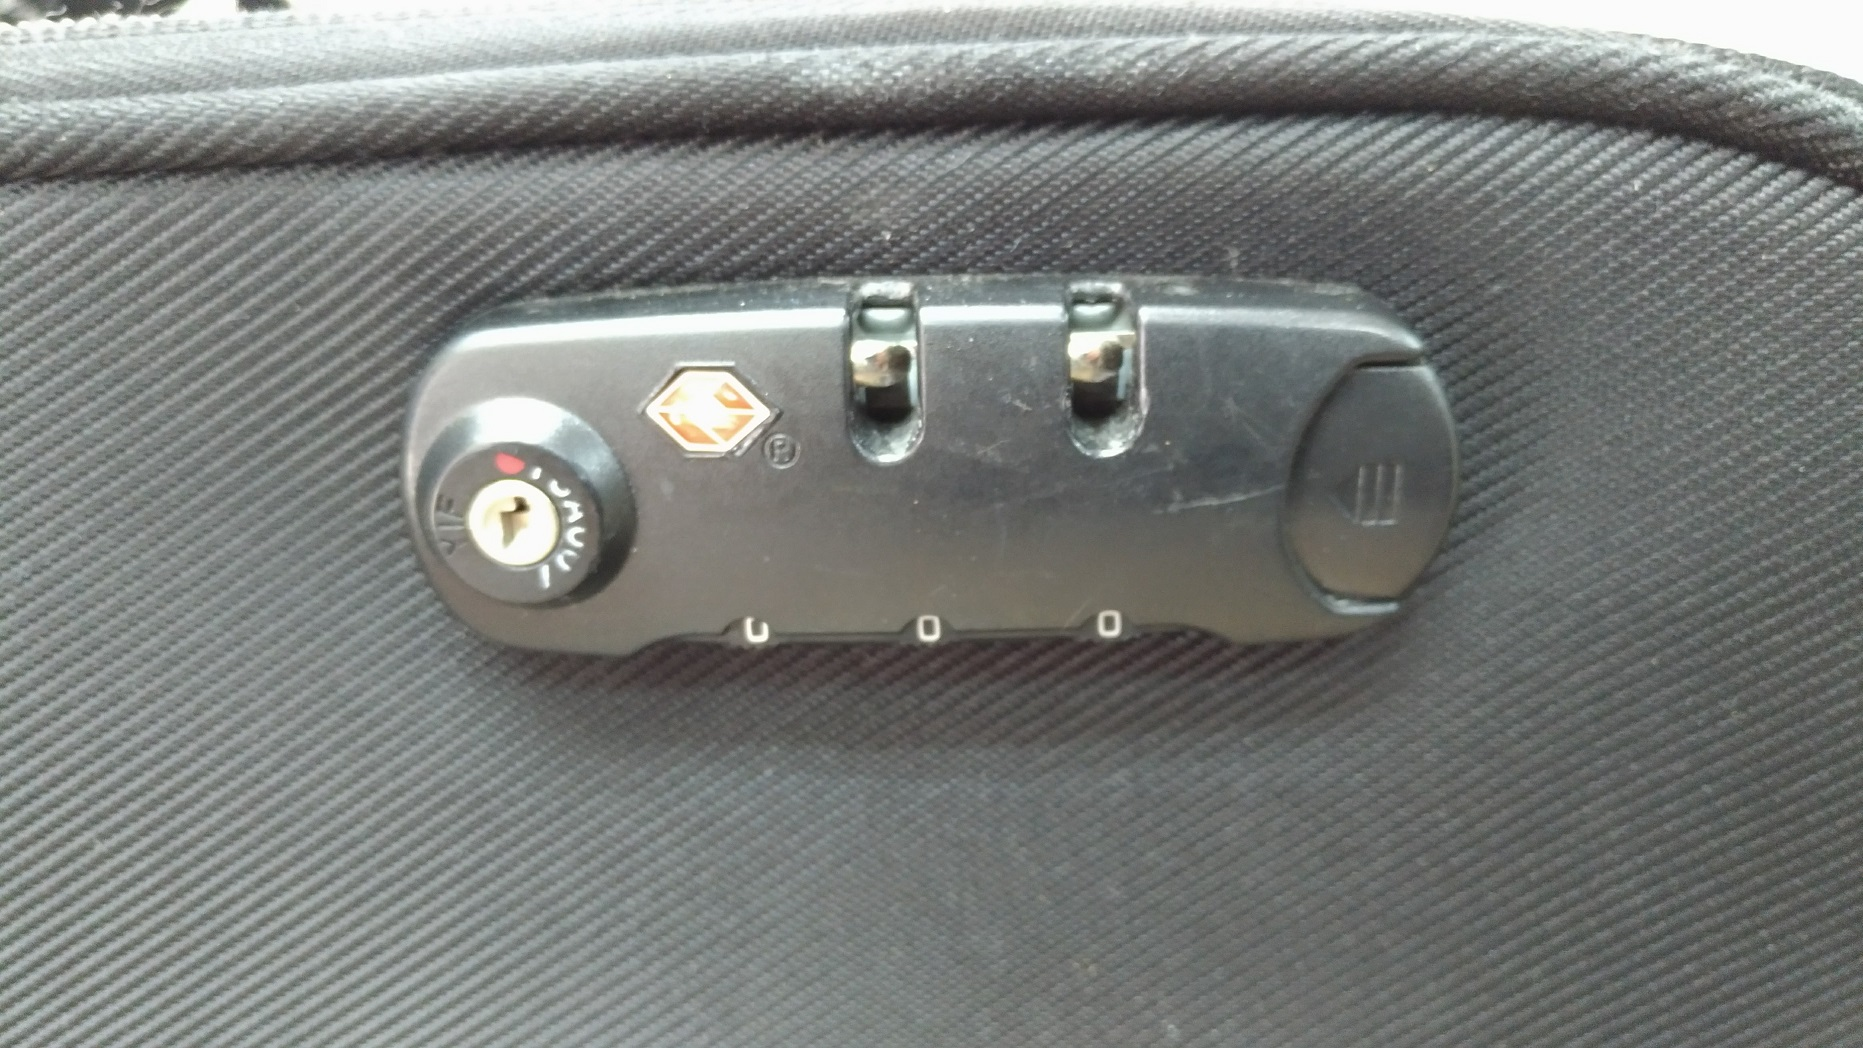 TSAロック付きのダイヤルタイプ